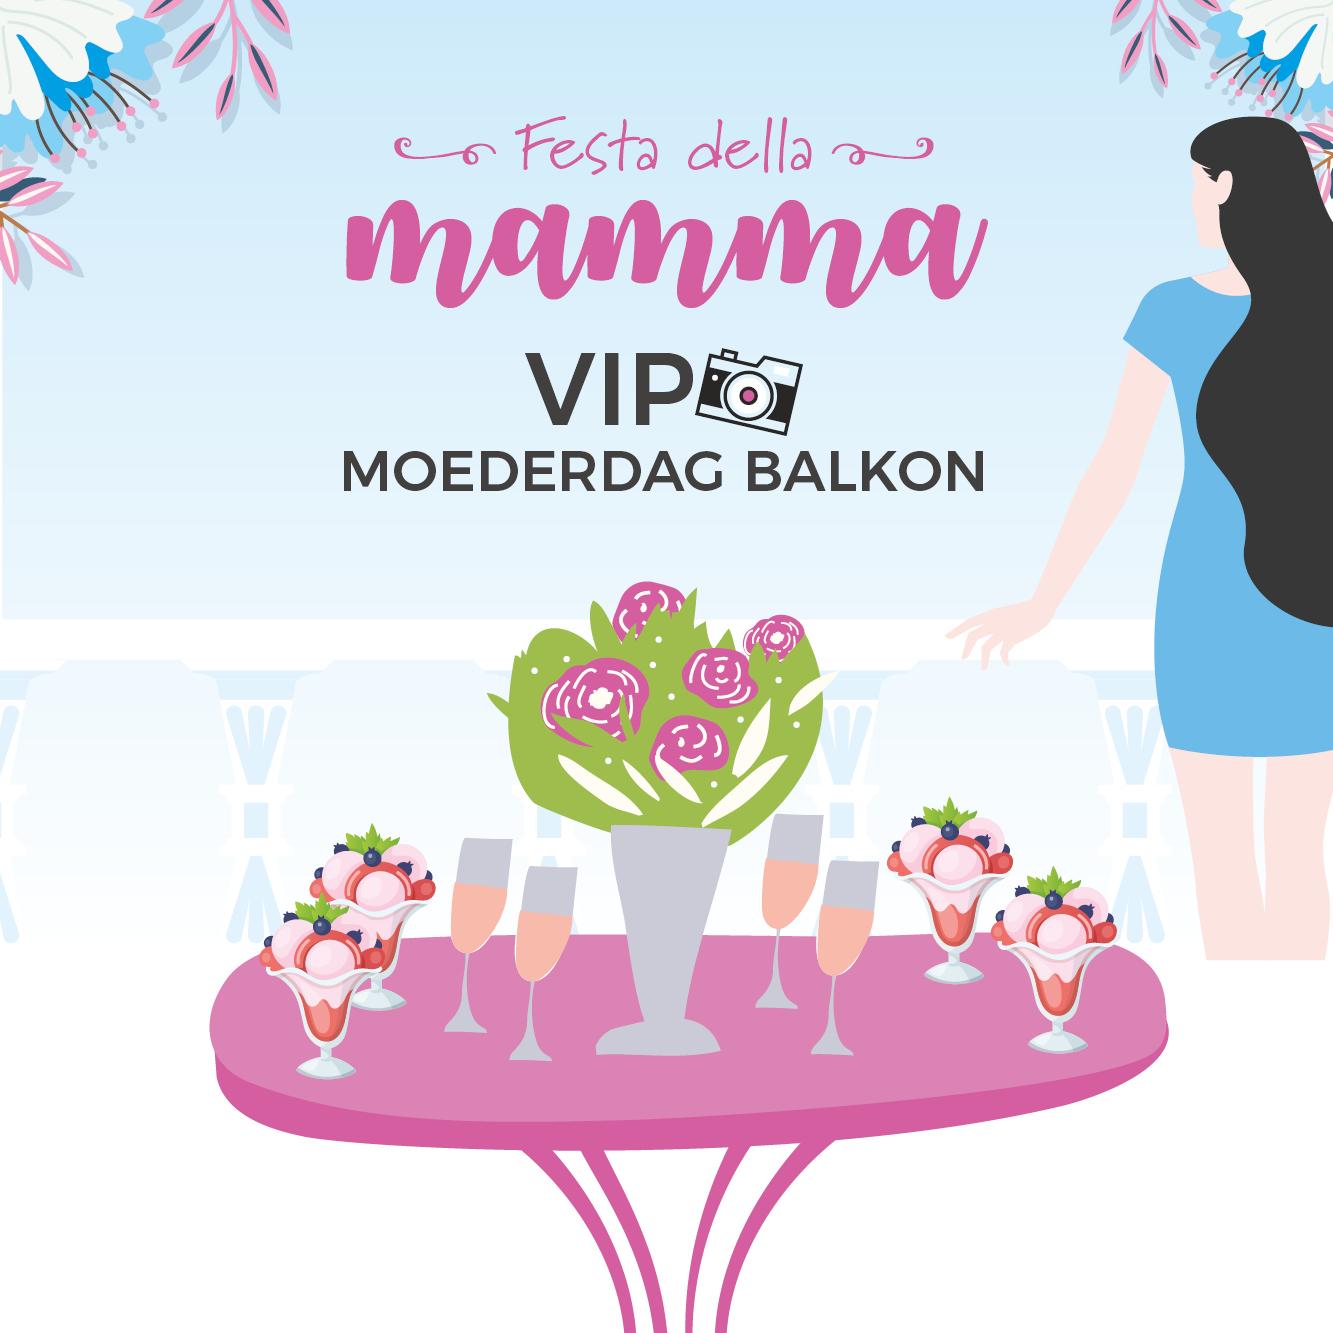 VIP MOEDERDAG BALKON